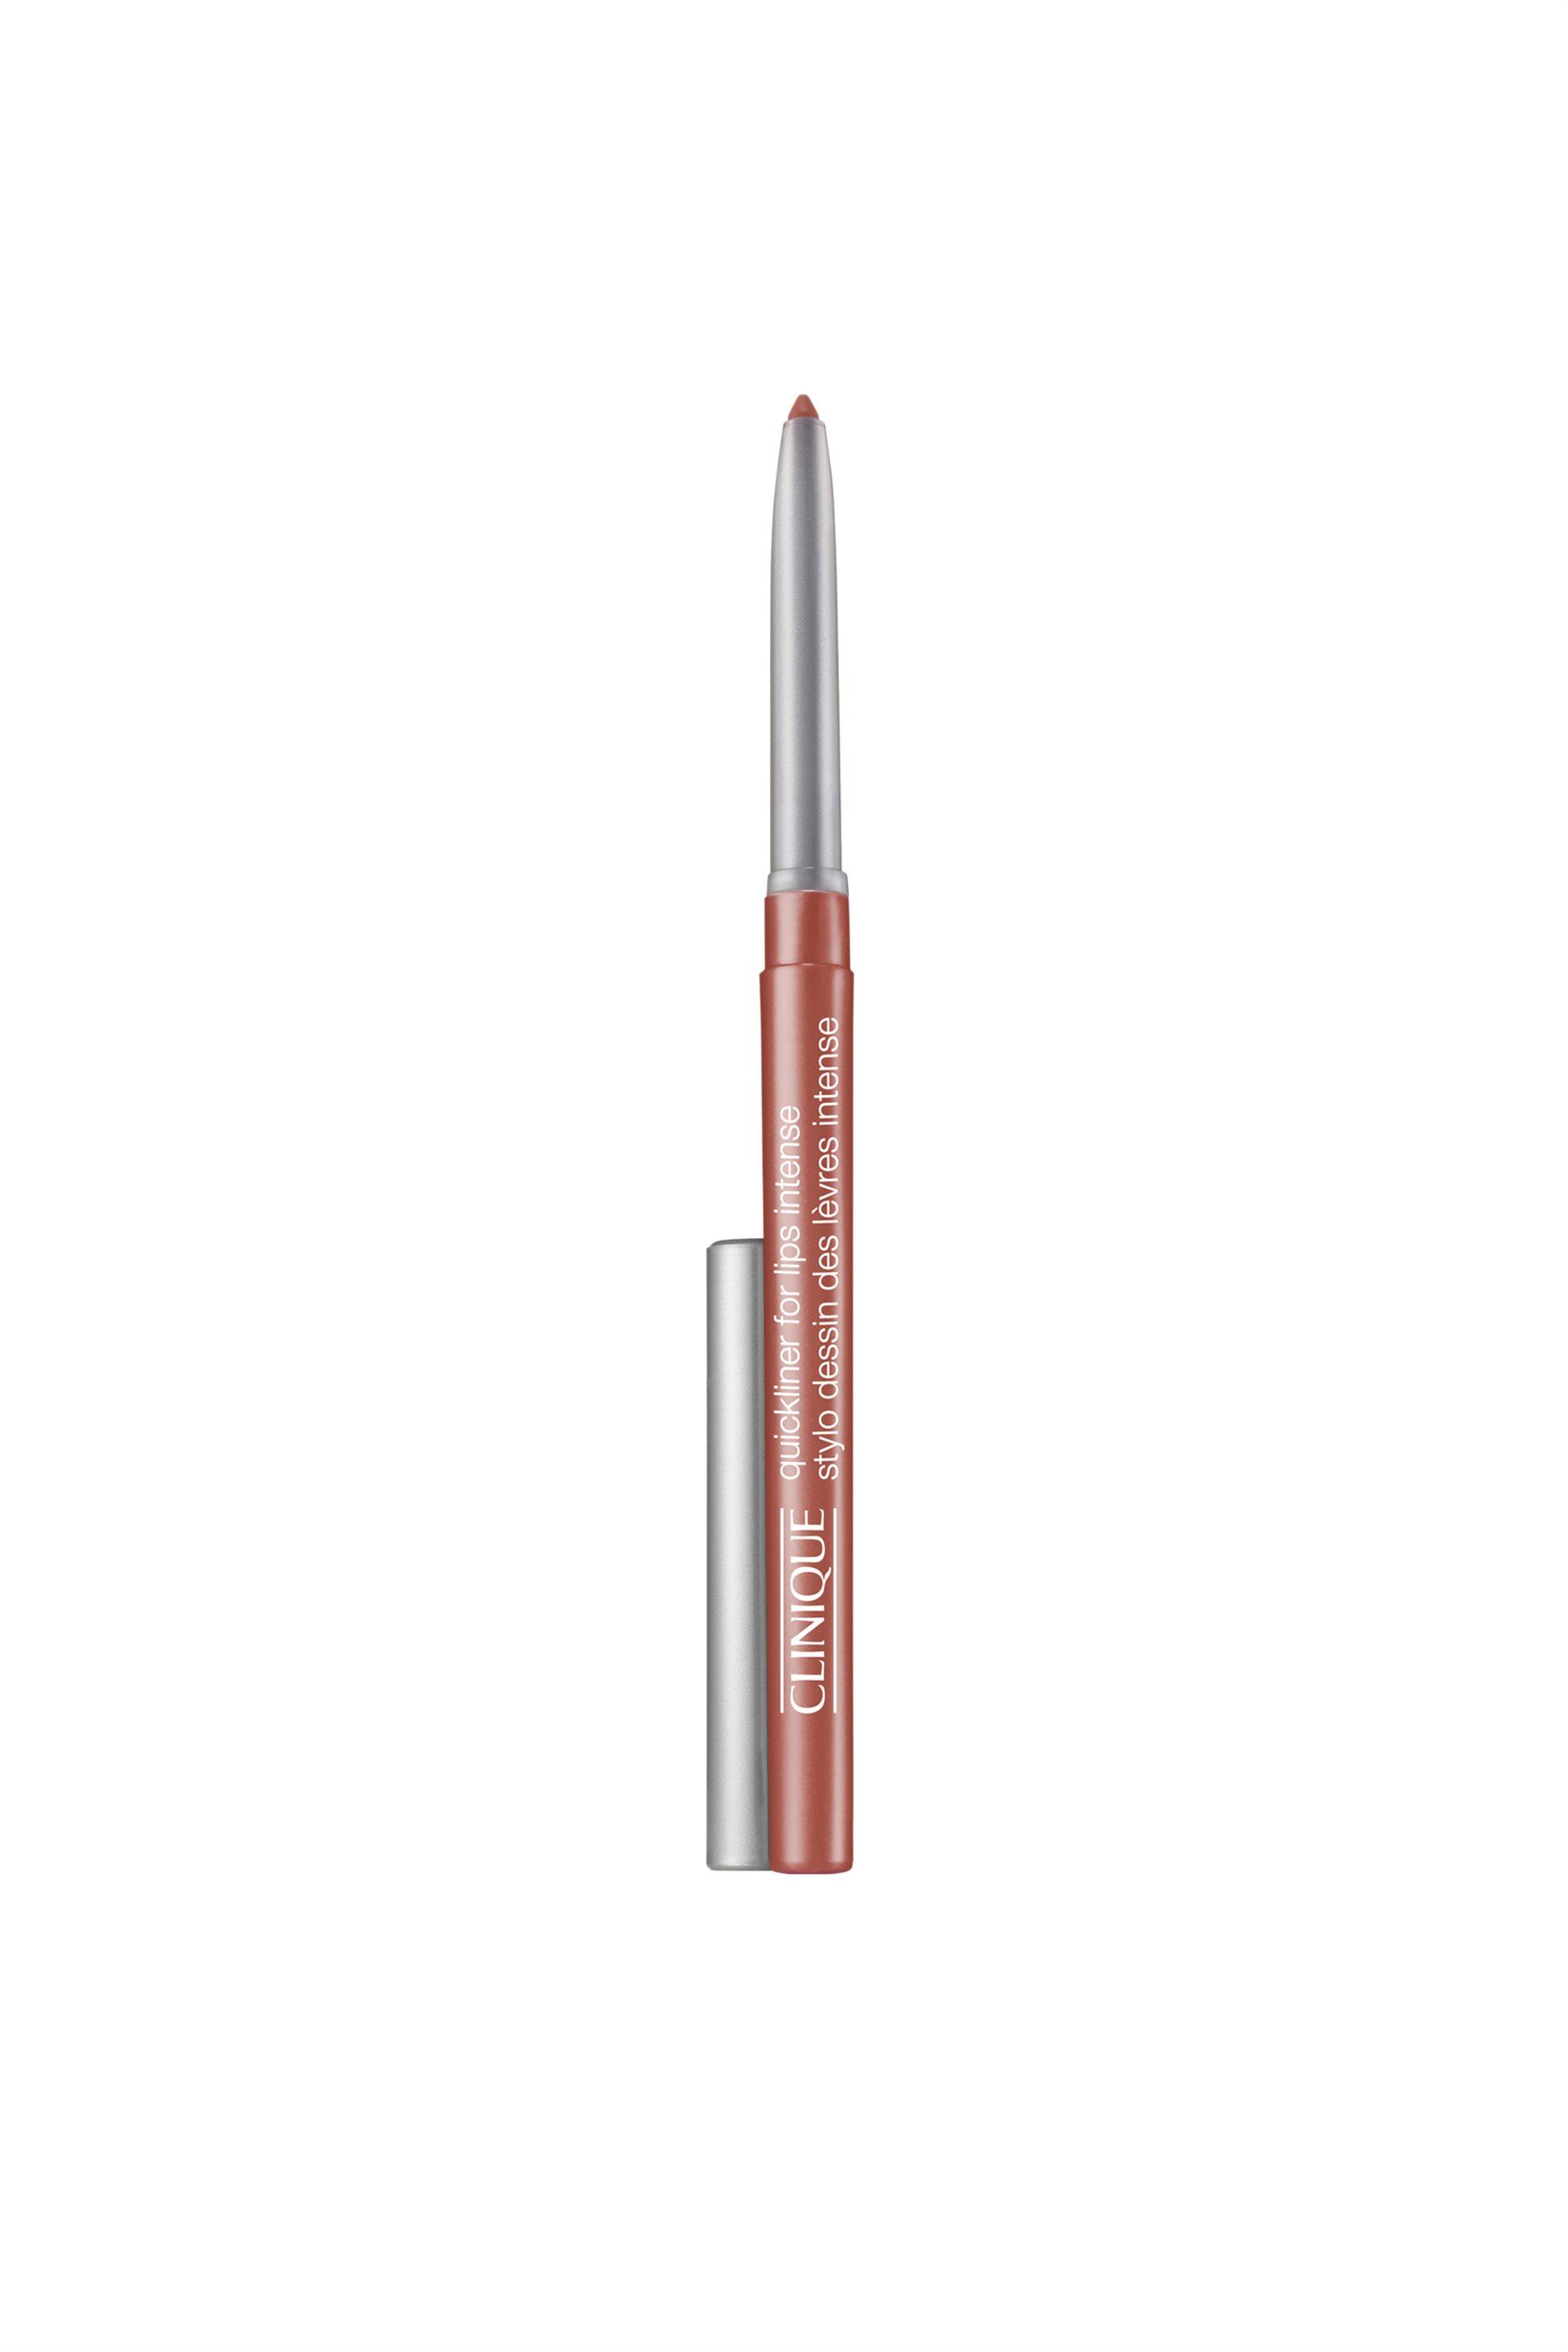 Clinique Quickliner™ for Lips Intense 07 Intense Blush 0.3 gr. - ZGGY070000 ομορφια   καλλυντικα επιλεκτικησ   μακιγιάζ   χείλη   μολύβια χειλιών